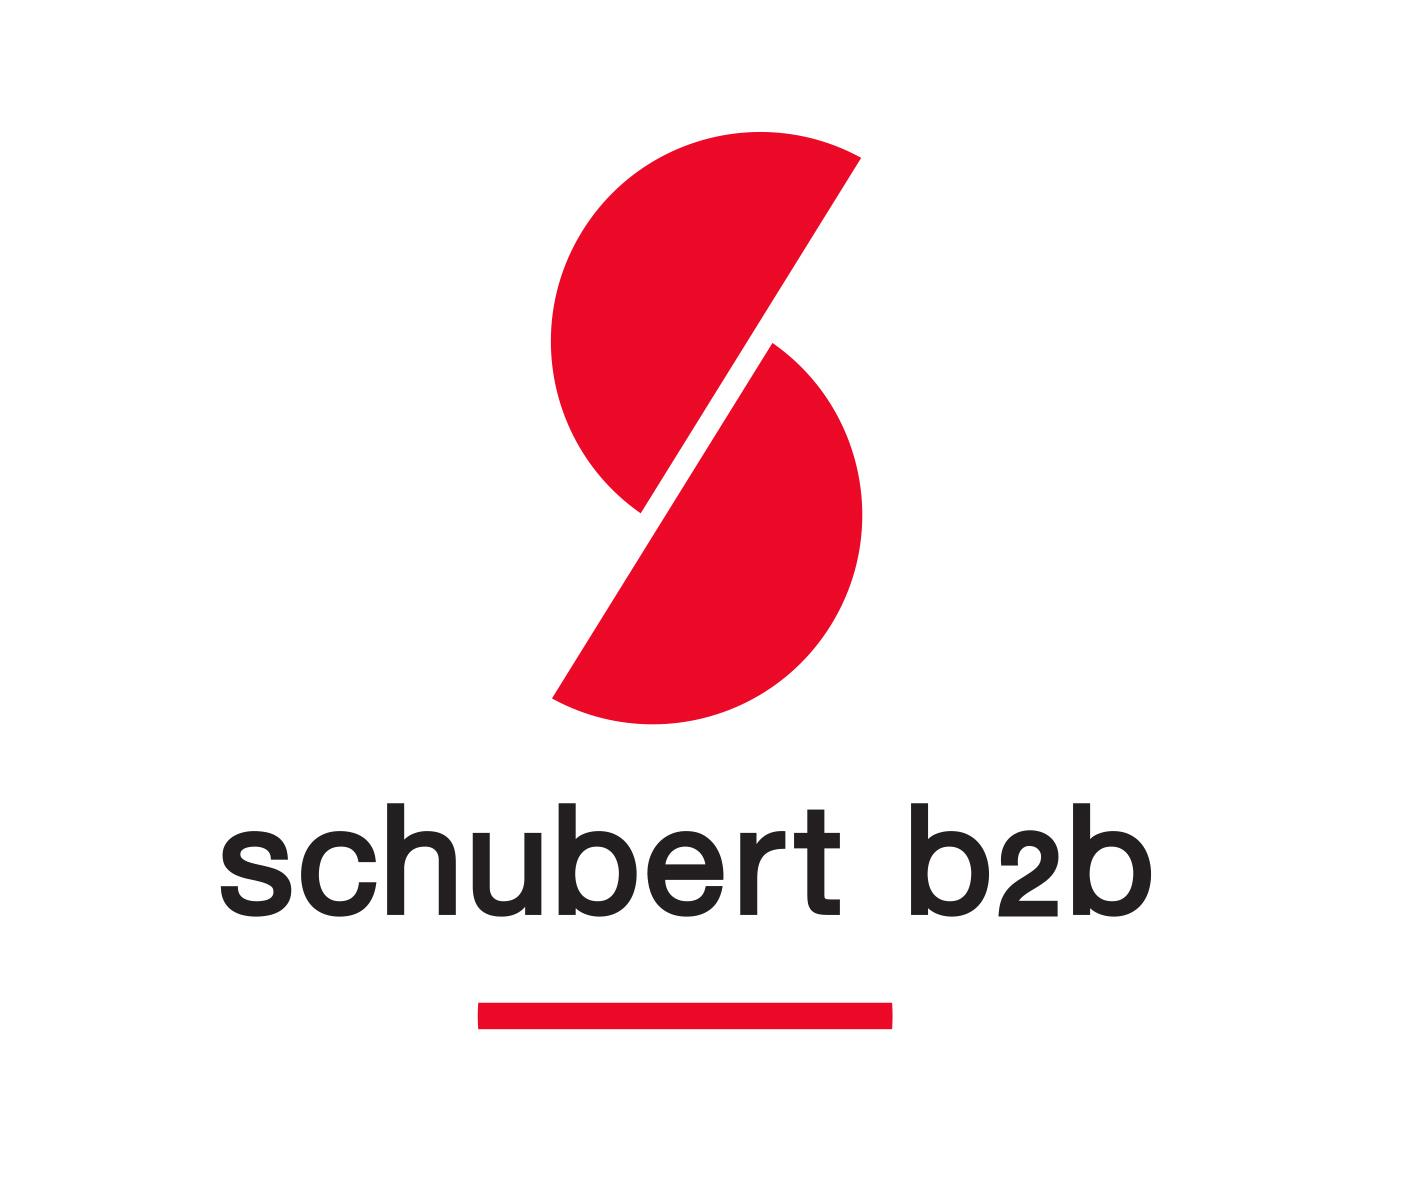 Schubert b2b